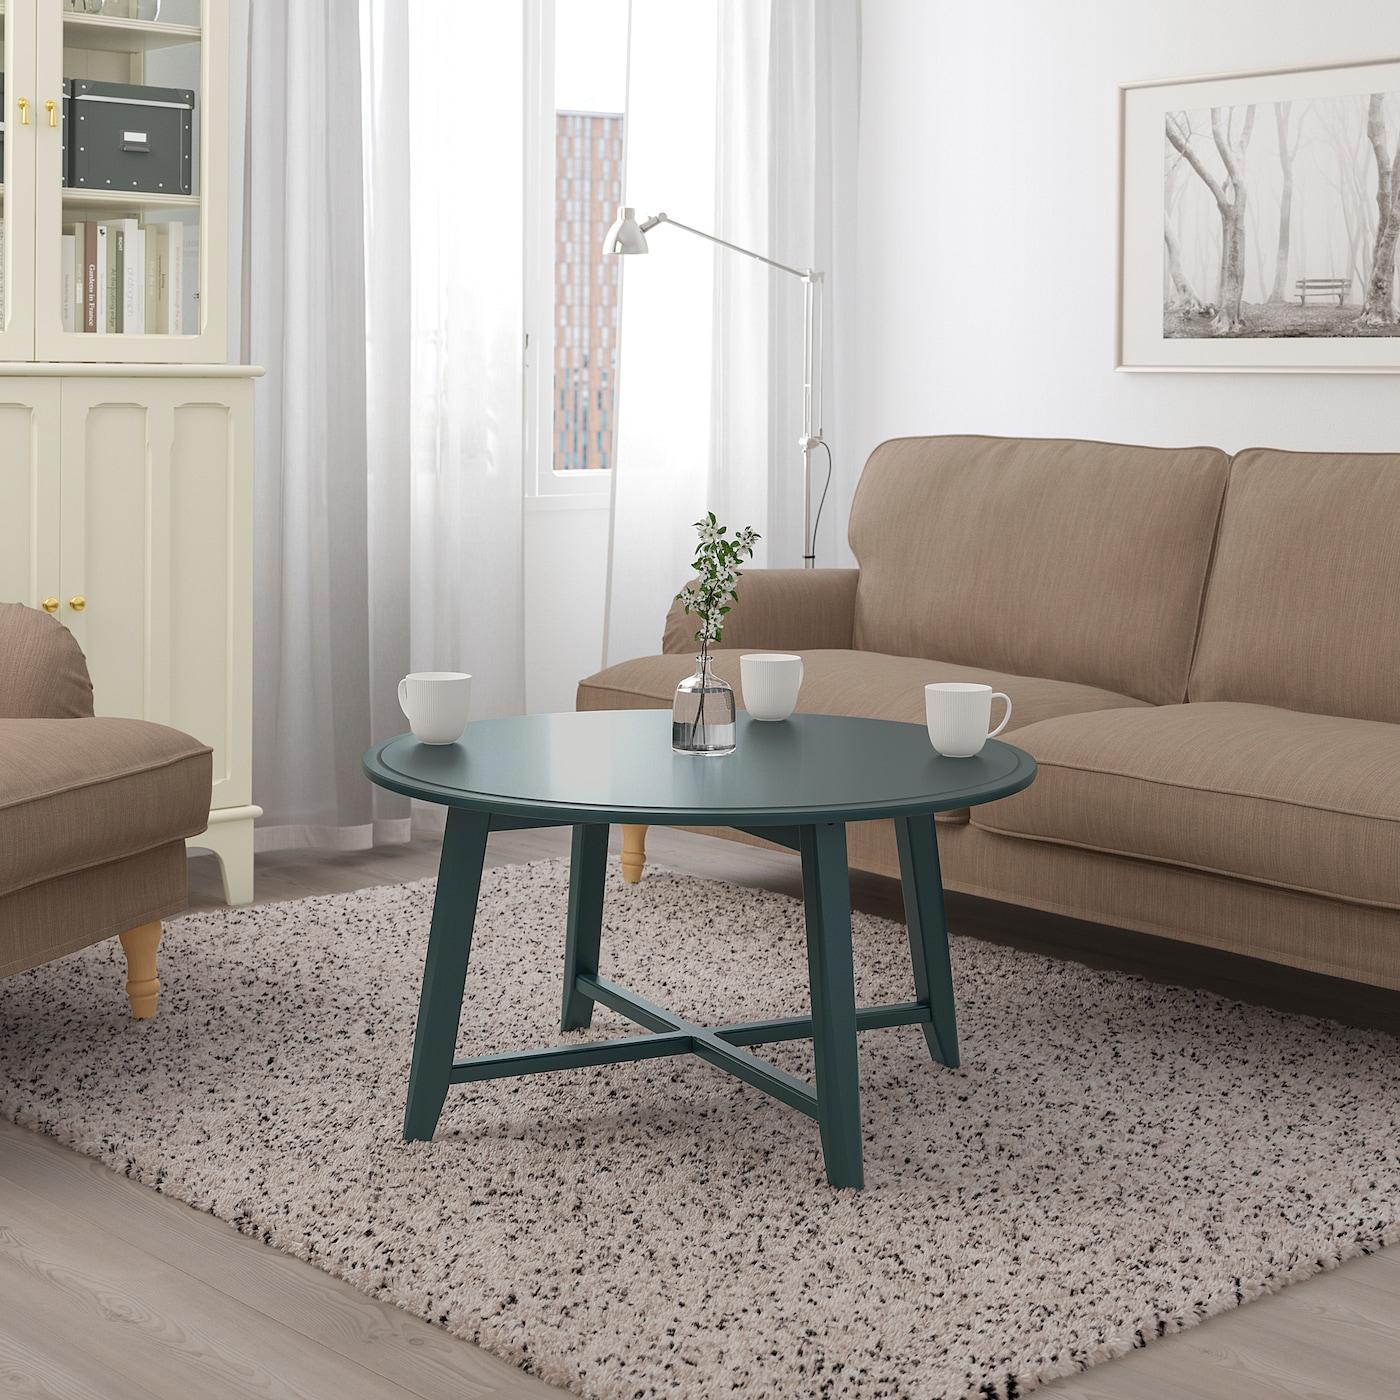 Kragsta Coffee Table Dark Blue Green 90 Cm [ 1400 x 1400 Pixel ]